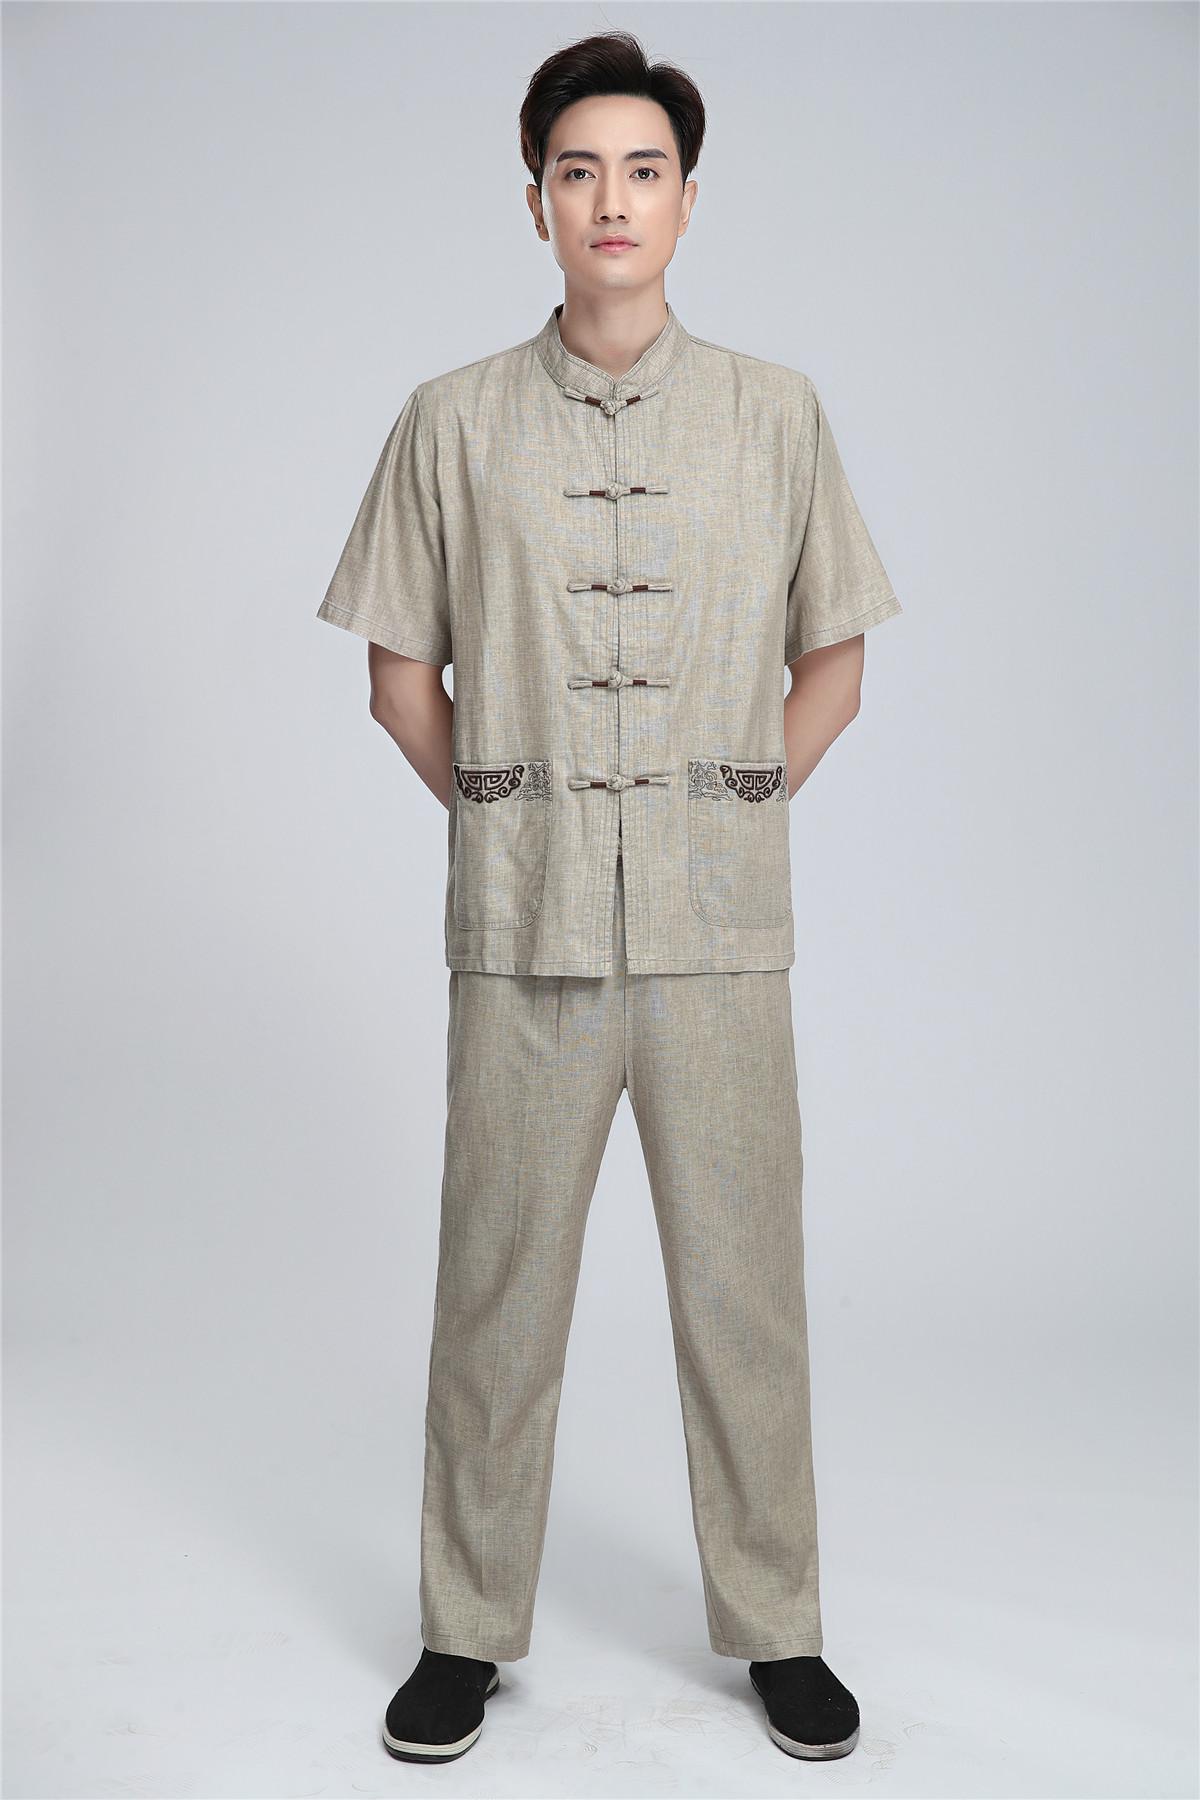 Kung fu Kungfu Chinese Script moisture wicking polyester workout black shorts